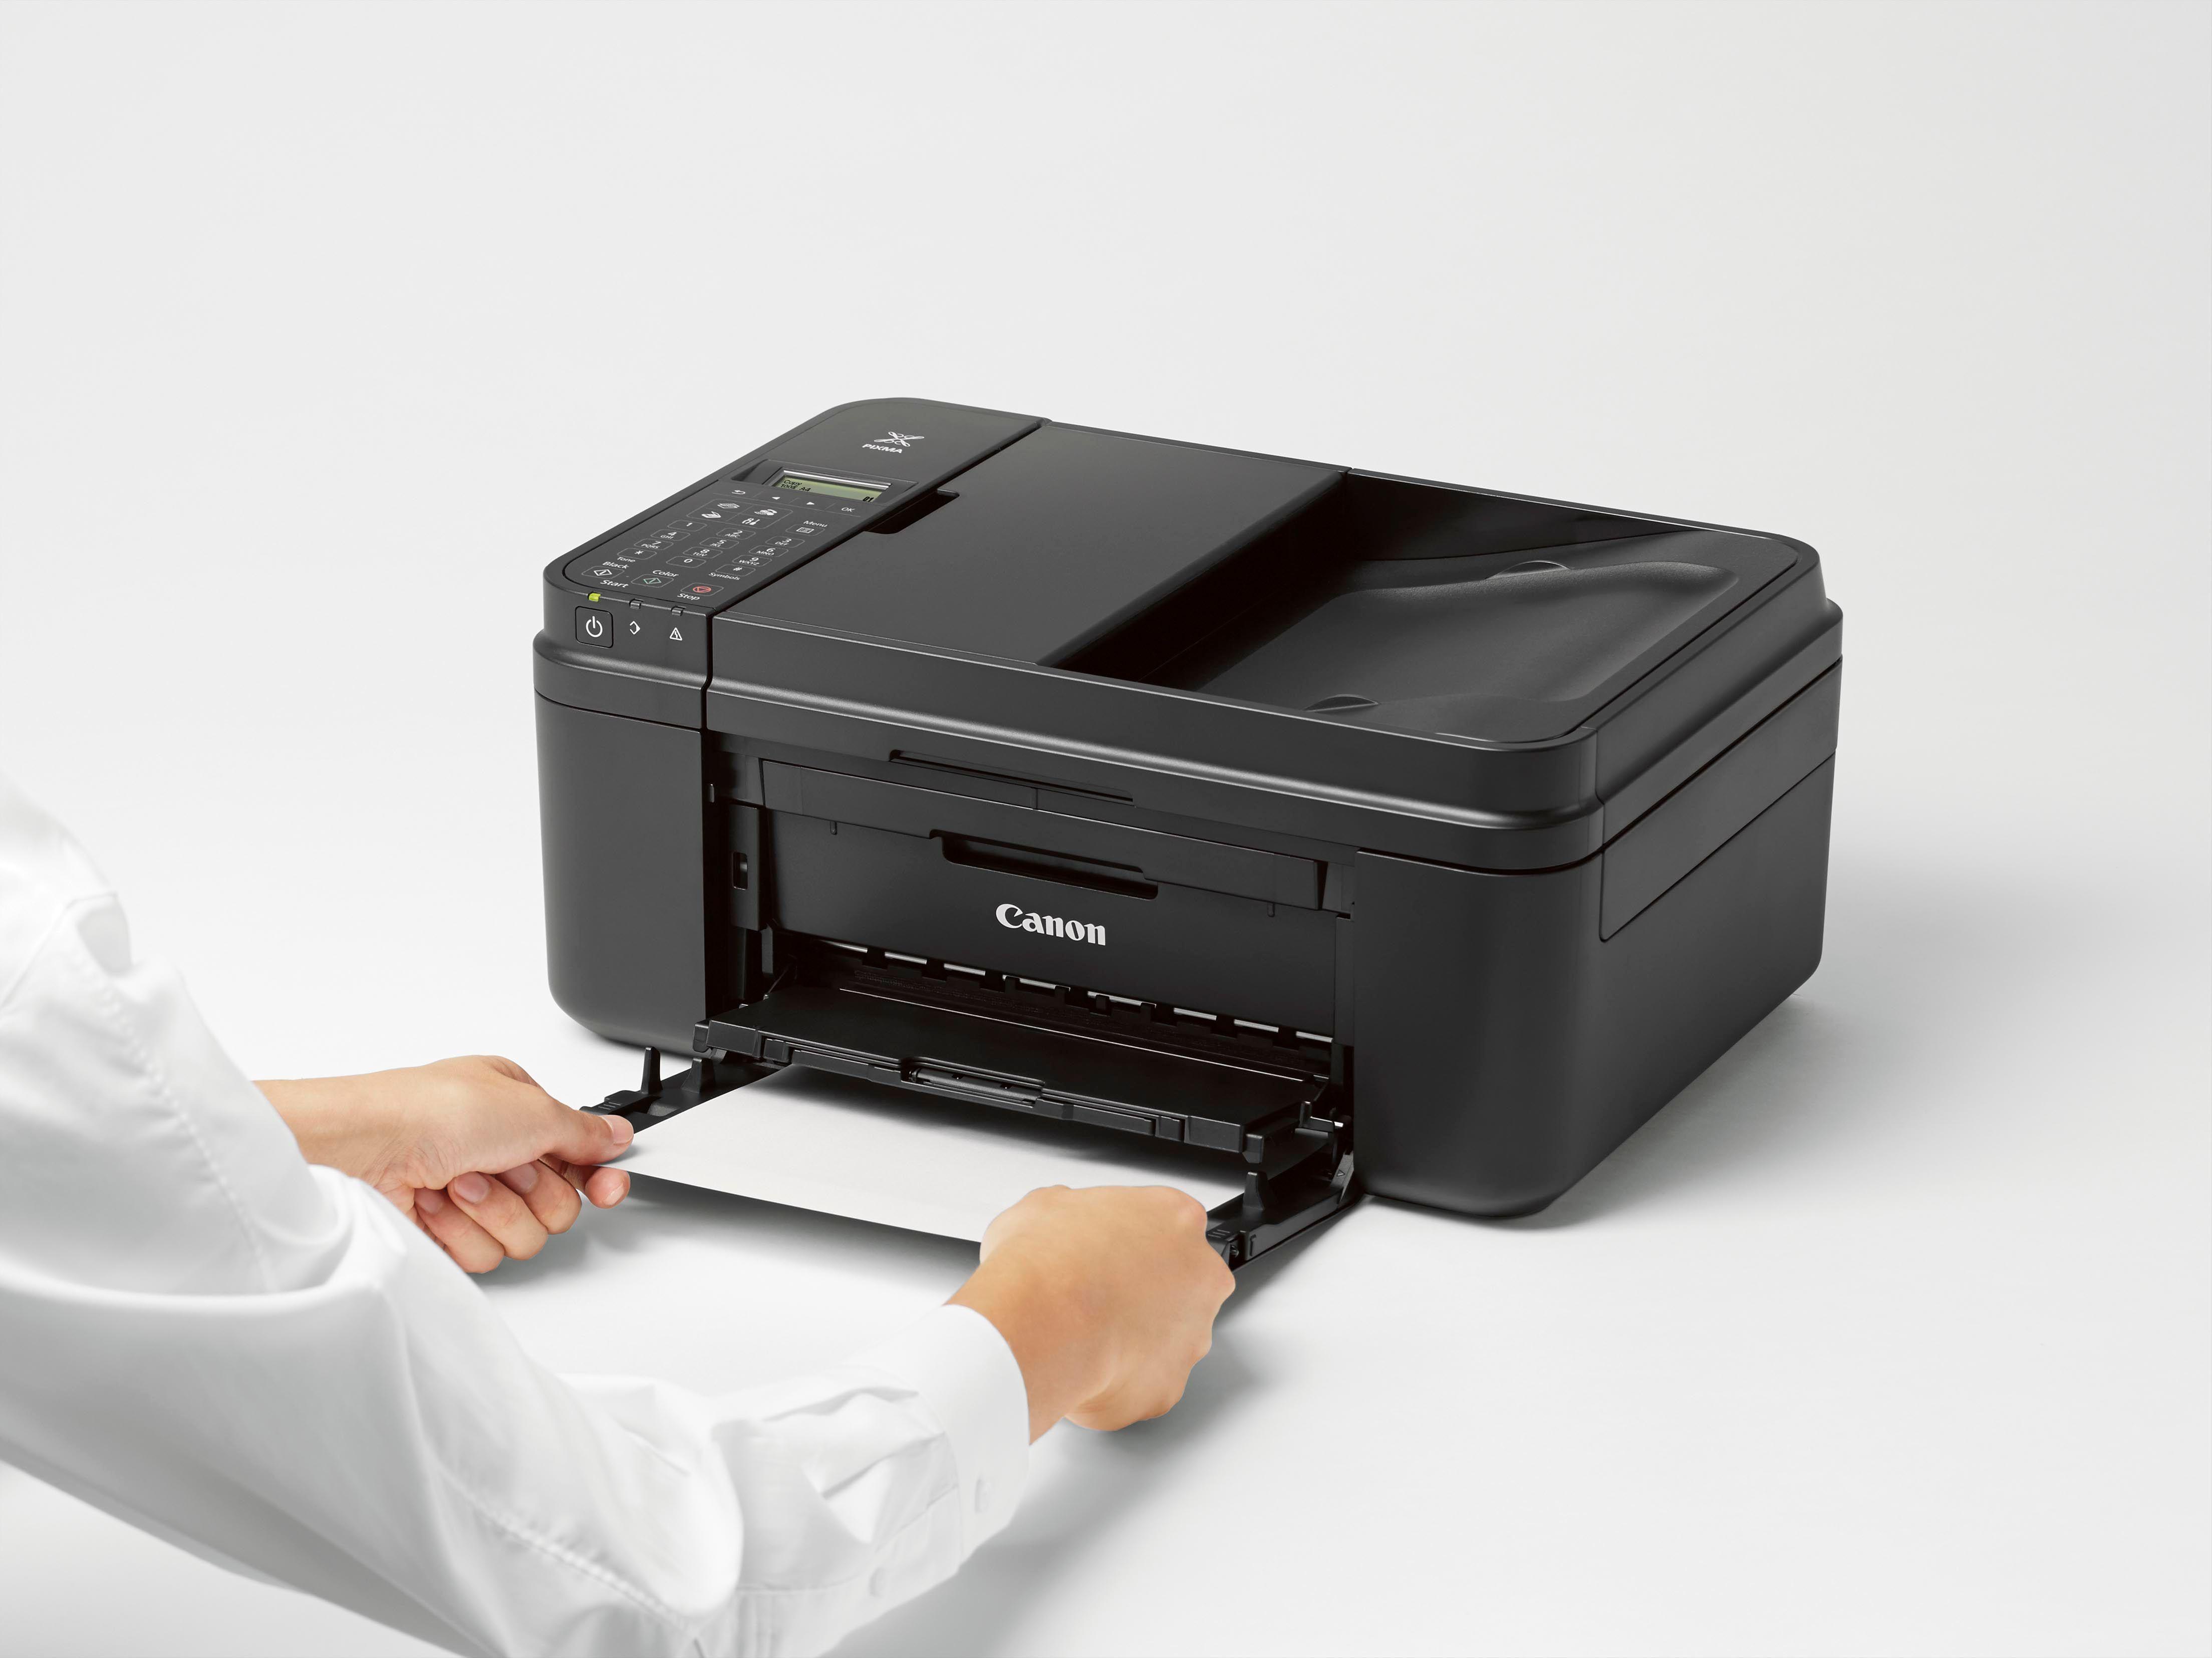 Canon PIXMA MX490 Wireless Office All-in-One Inkjet Printer